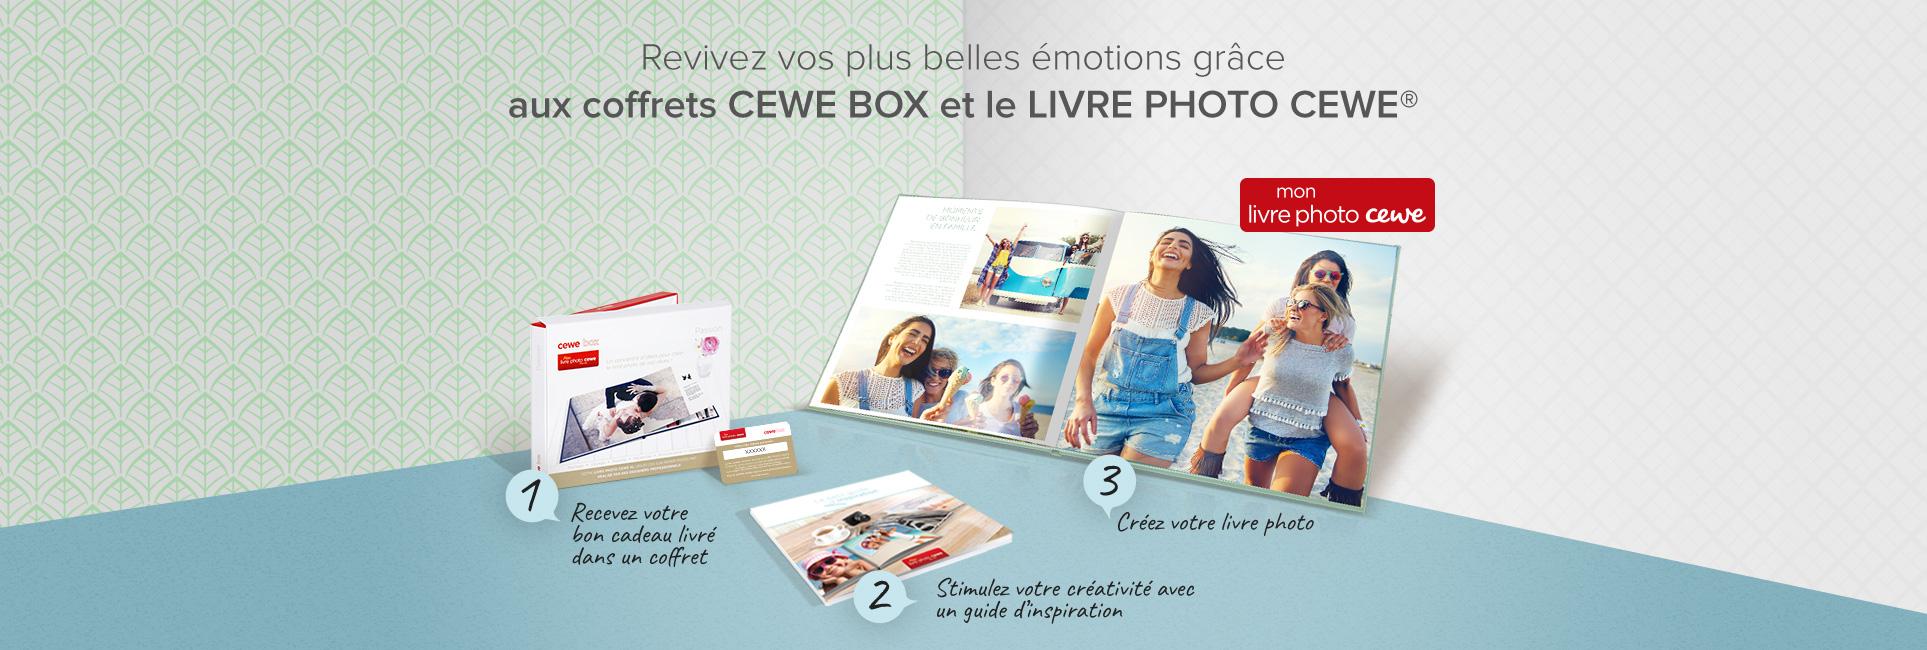 CEWE BOX Photo